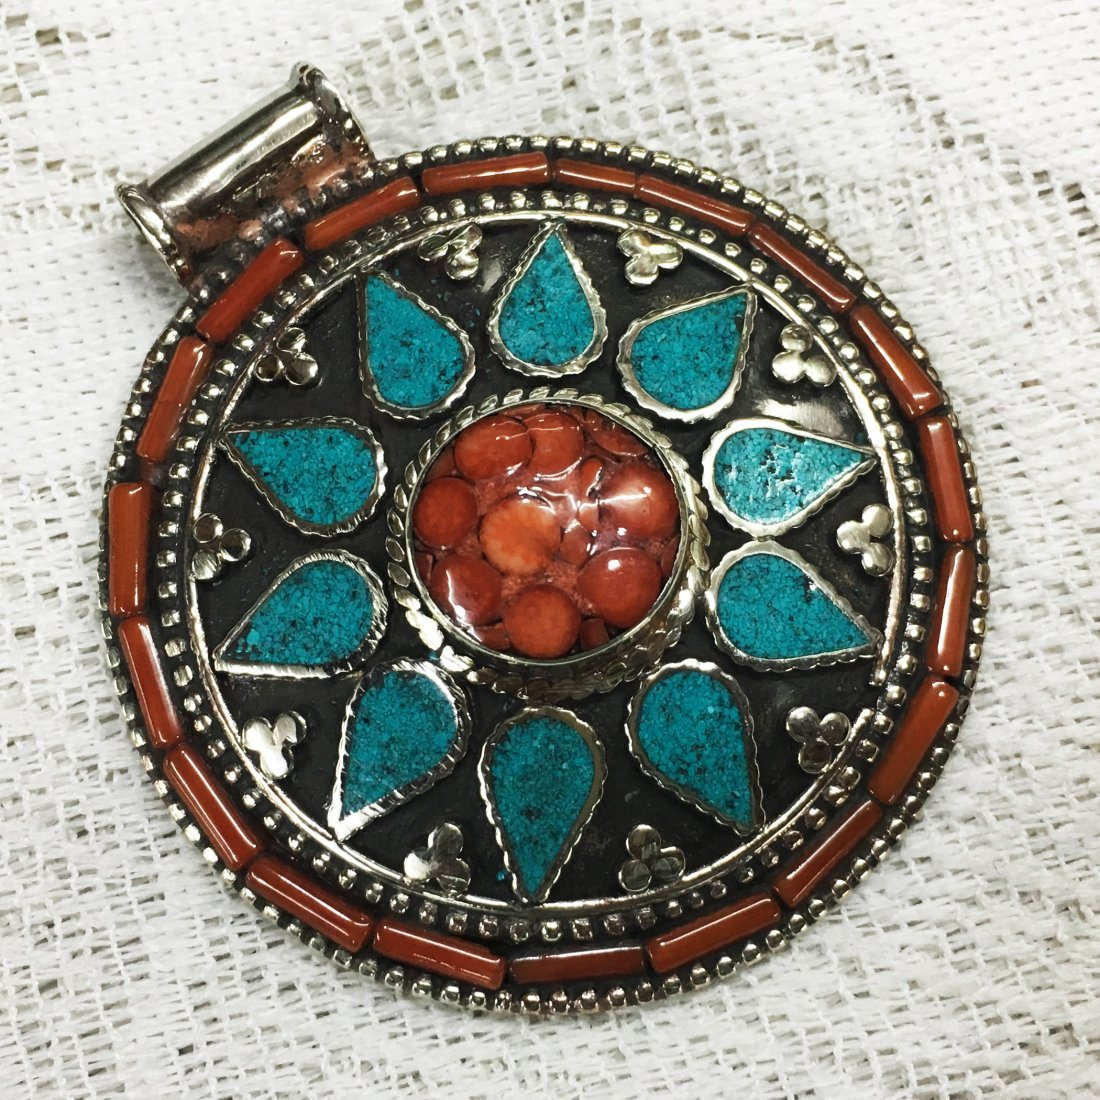 Tibetan Tribal Ethnic Tibetan Silver Pendant